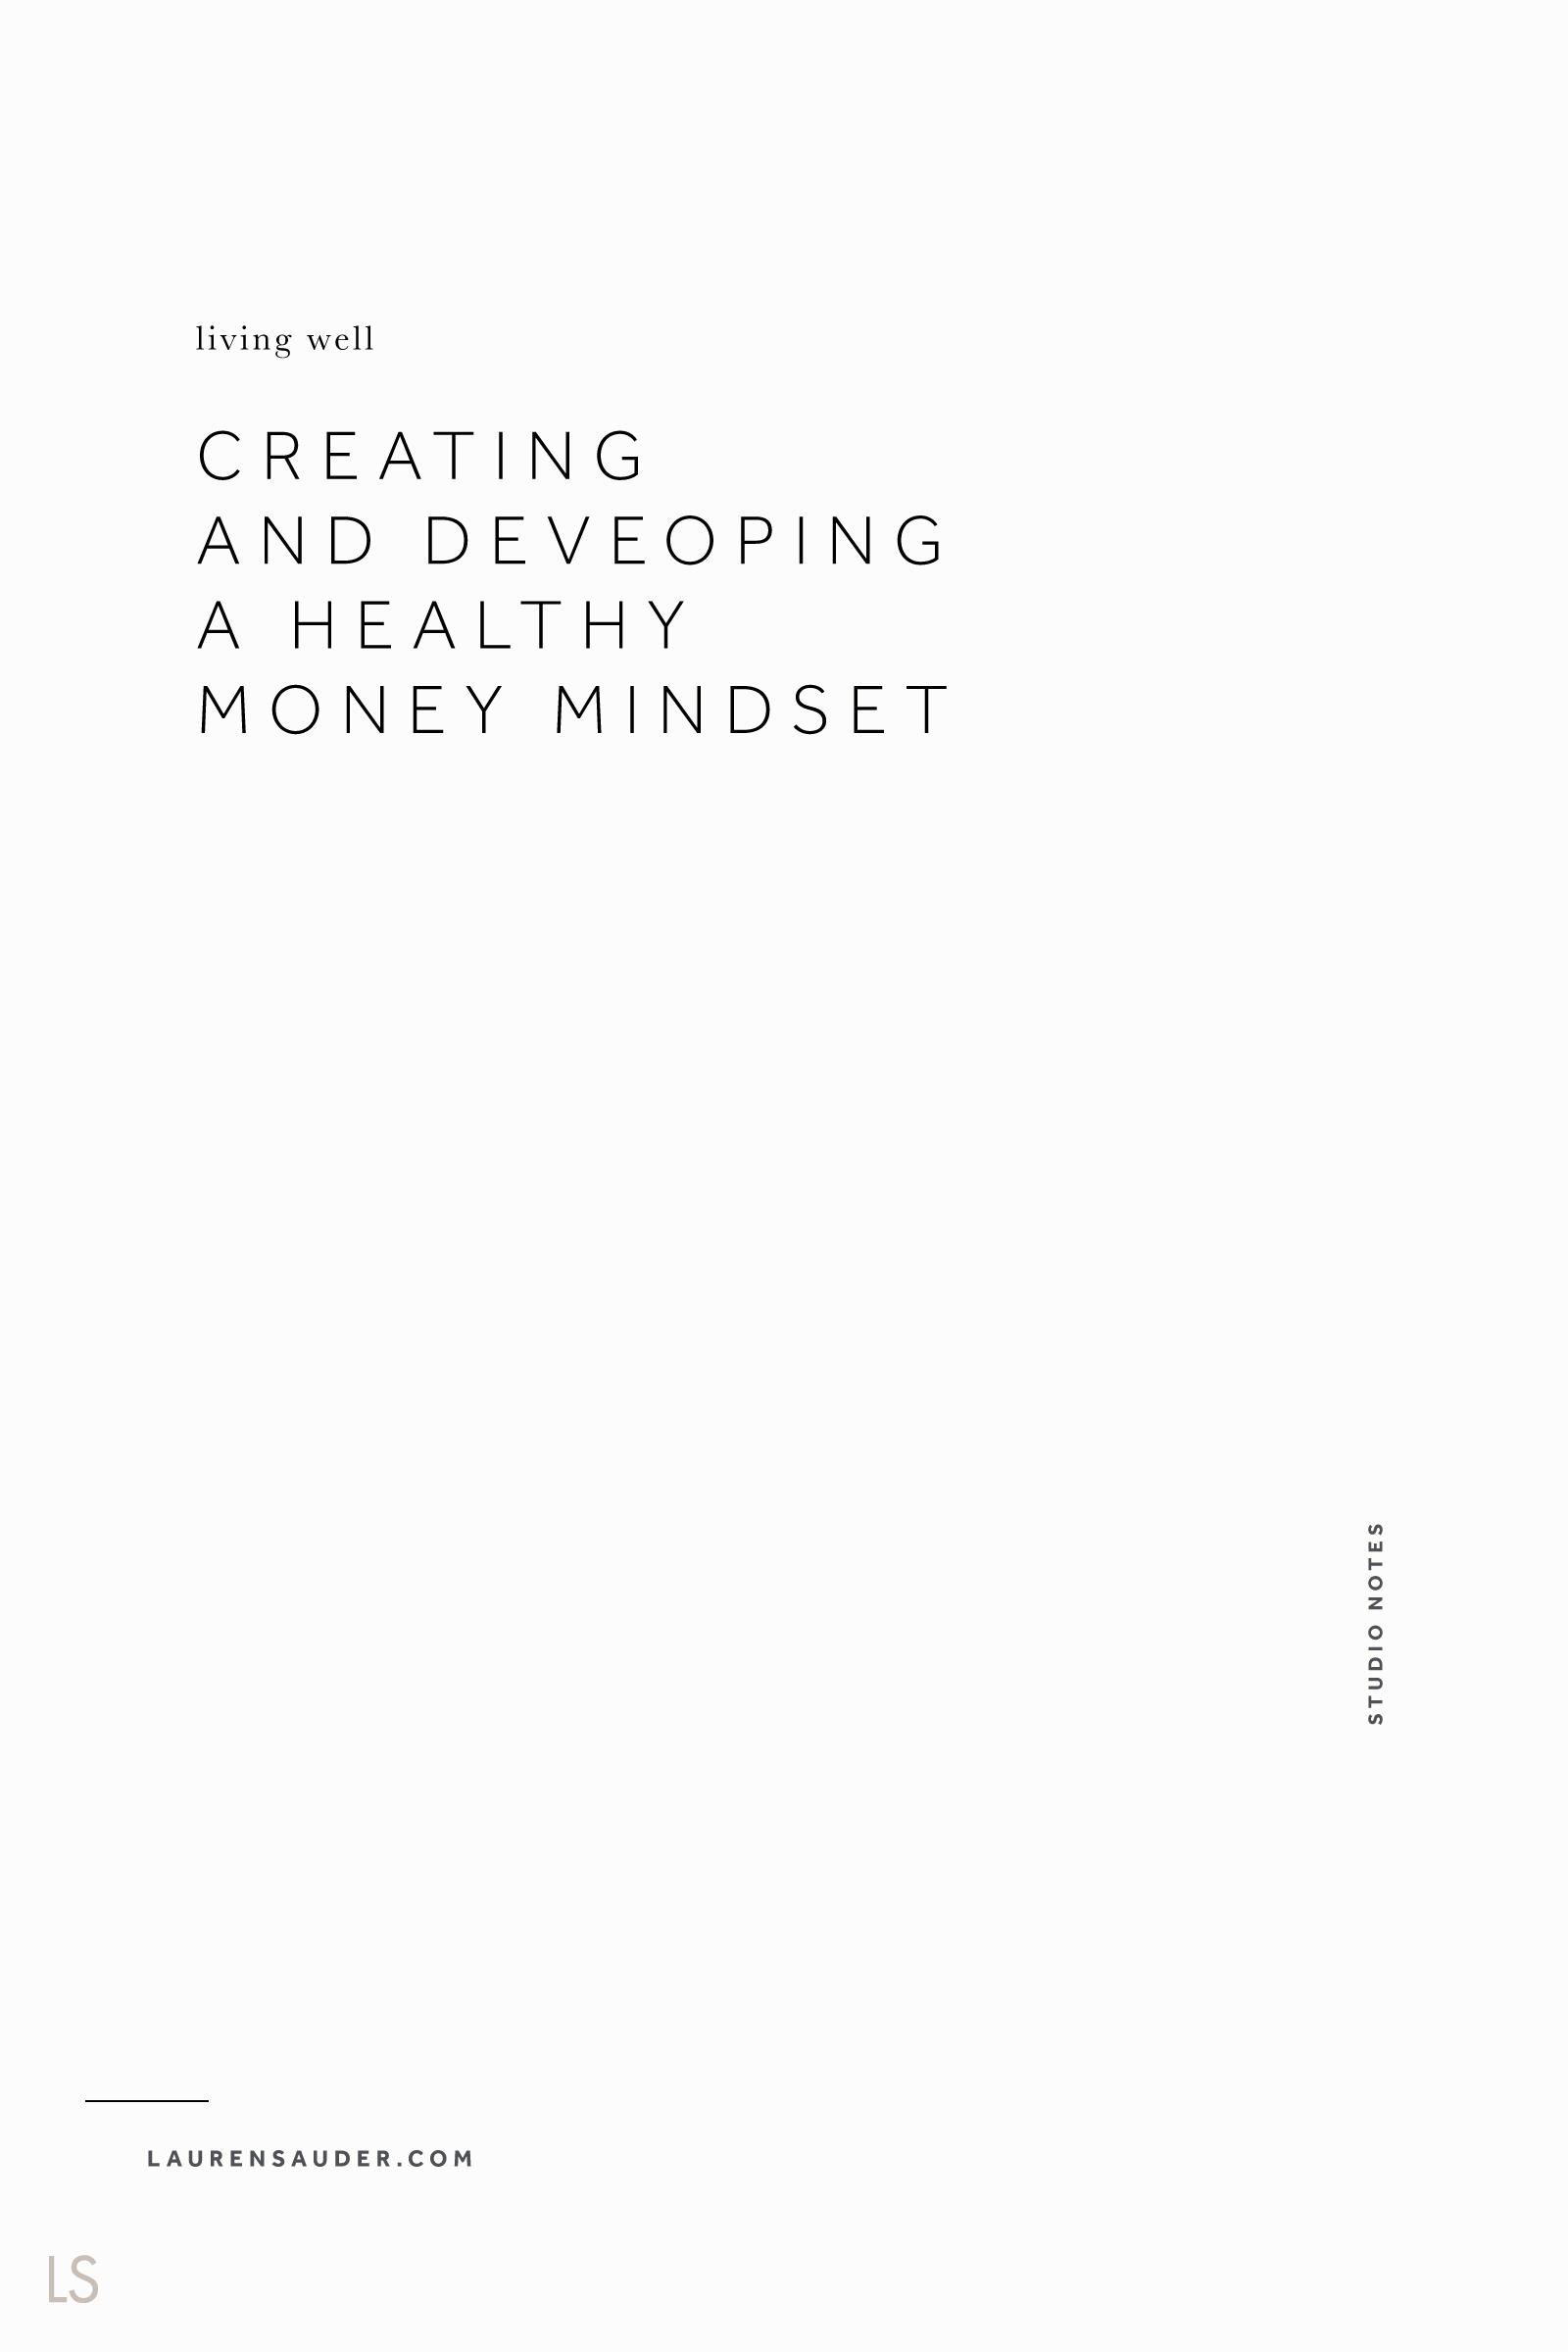 Creating and Developing a Healthy Money Mindset - Lauren Sauder #money #budgeting money mindset, budgeting money, money health, money conscious, financial freedom